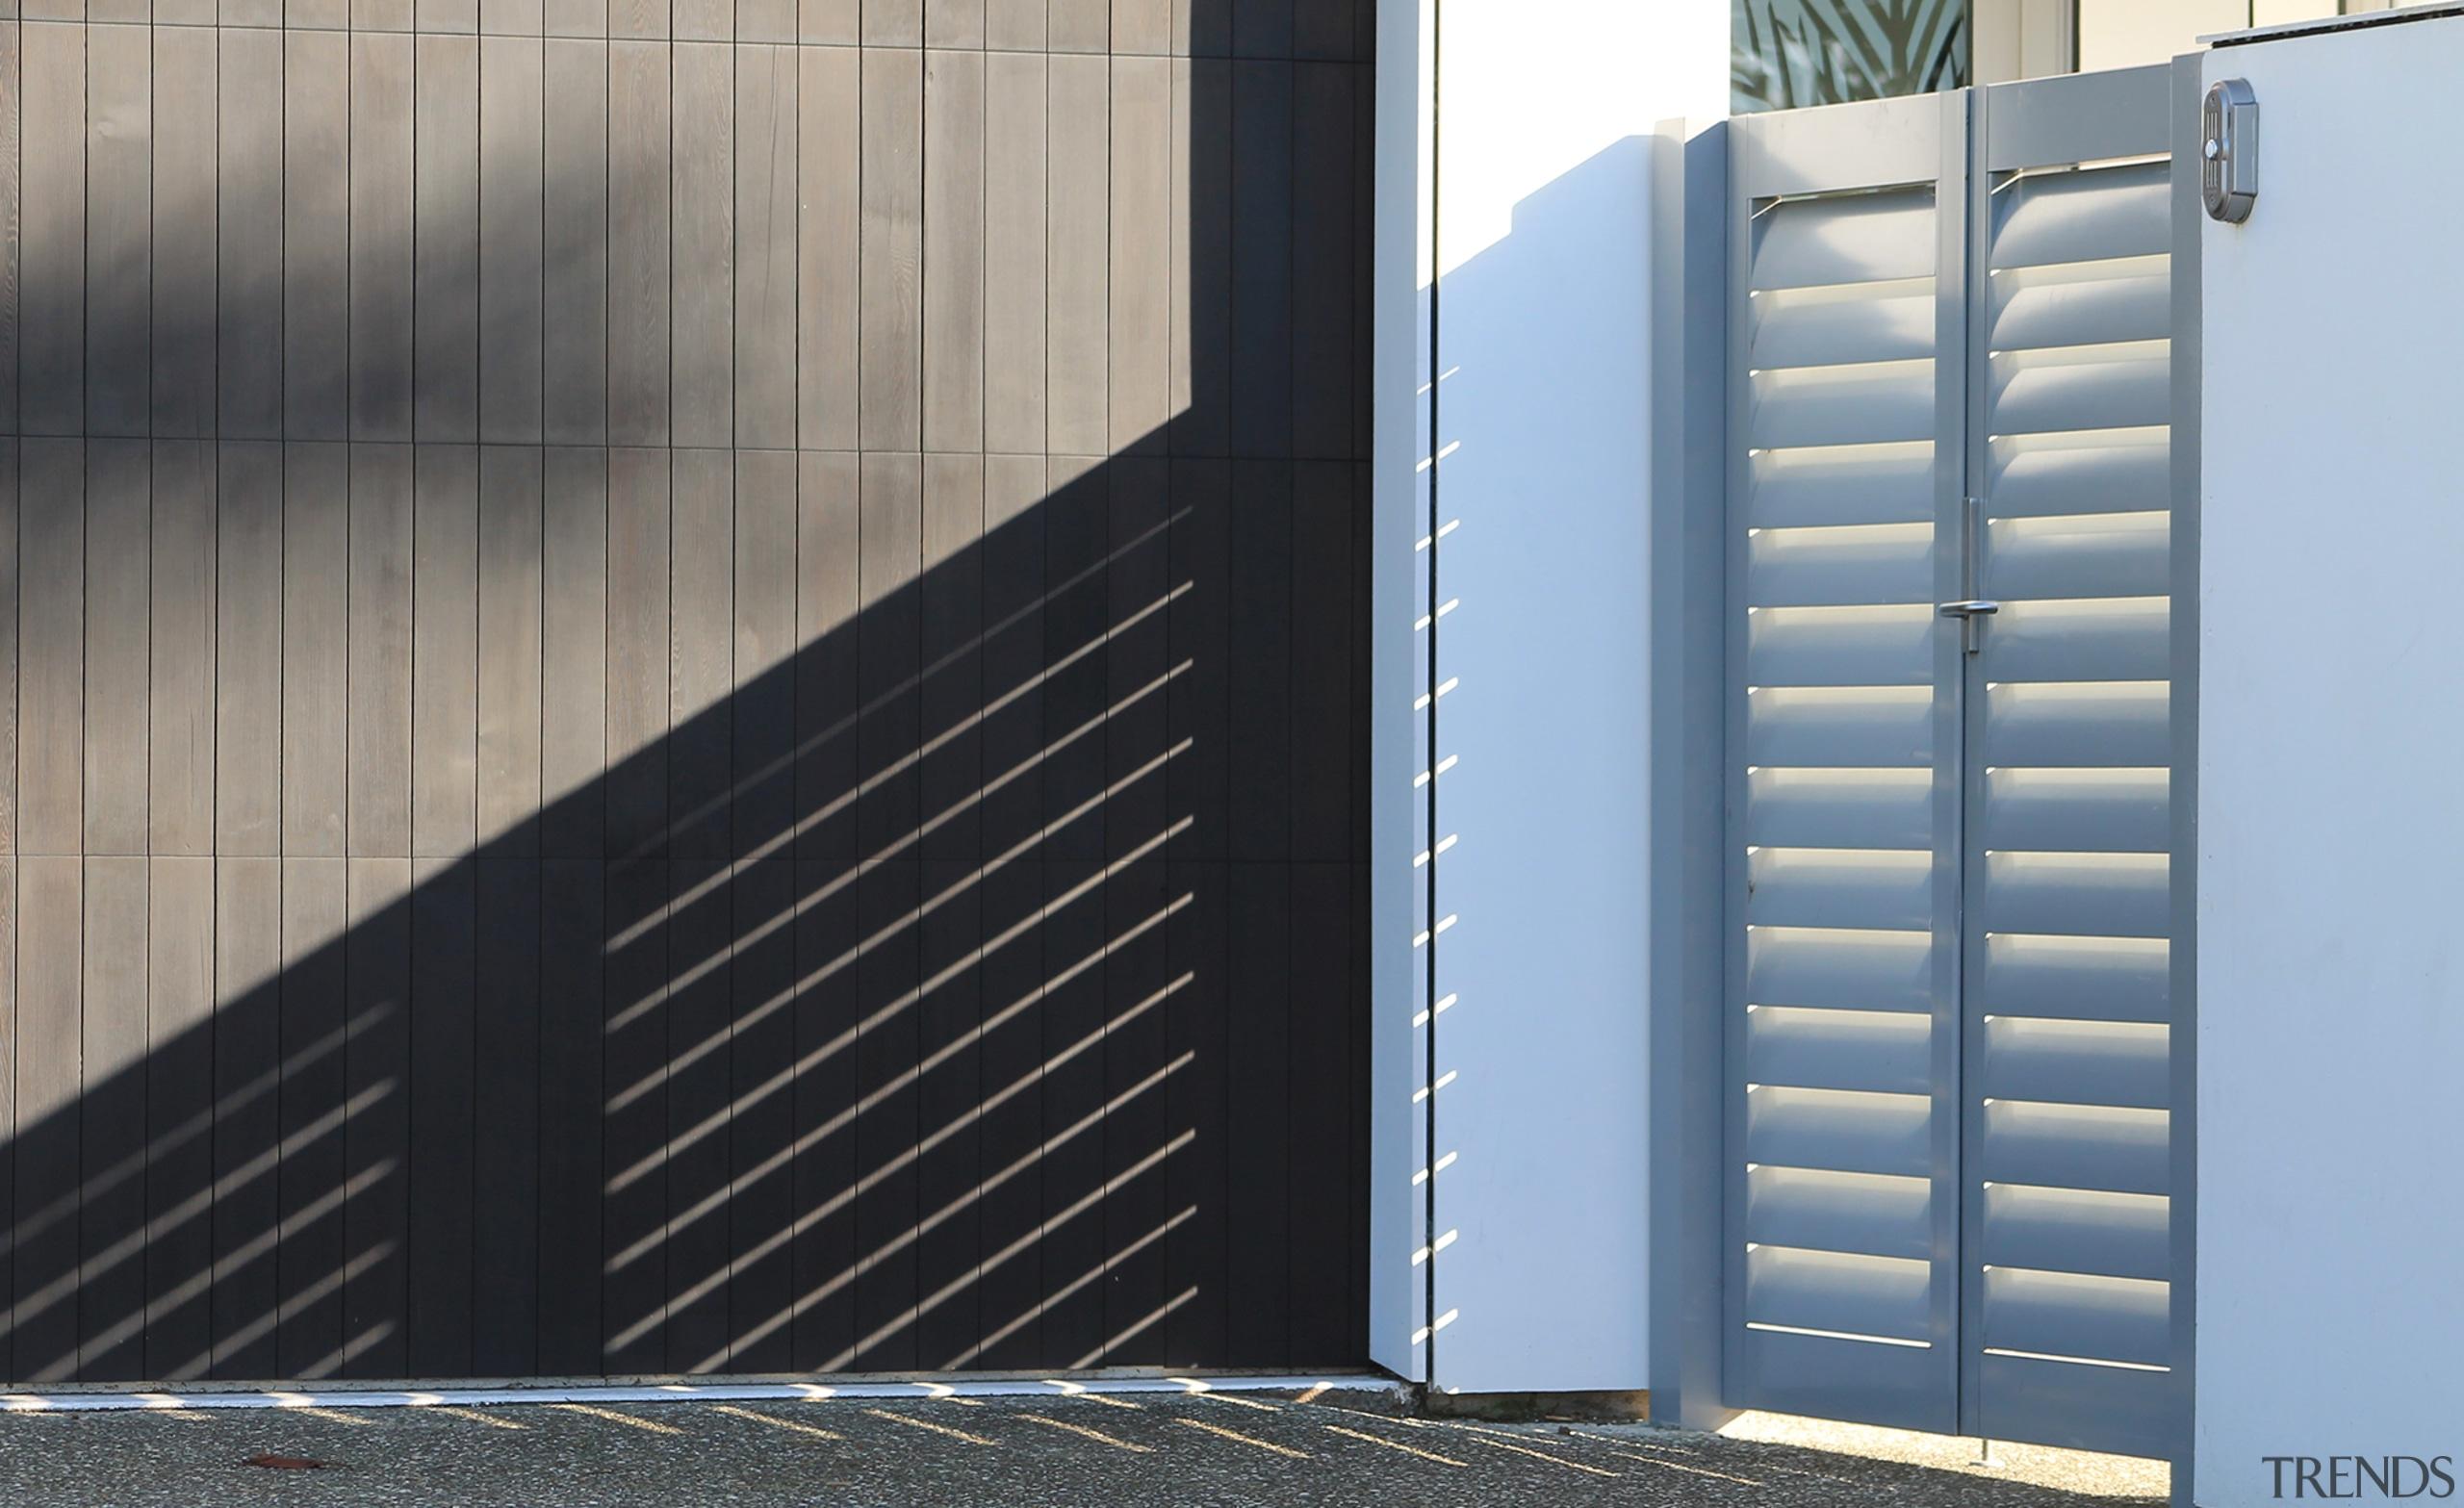 78580_louvretec-new-zealand-ltd_1556758041 - architecture   blue   composite material architecture, blue, composite material, daylighting, door, facade, gate, line, wall, window, gray, black